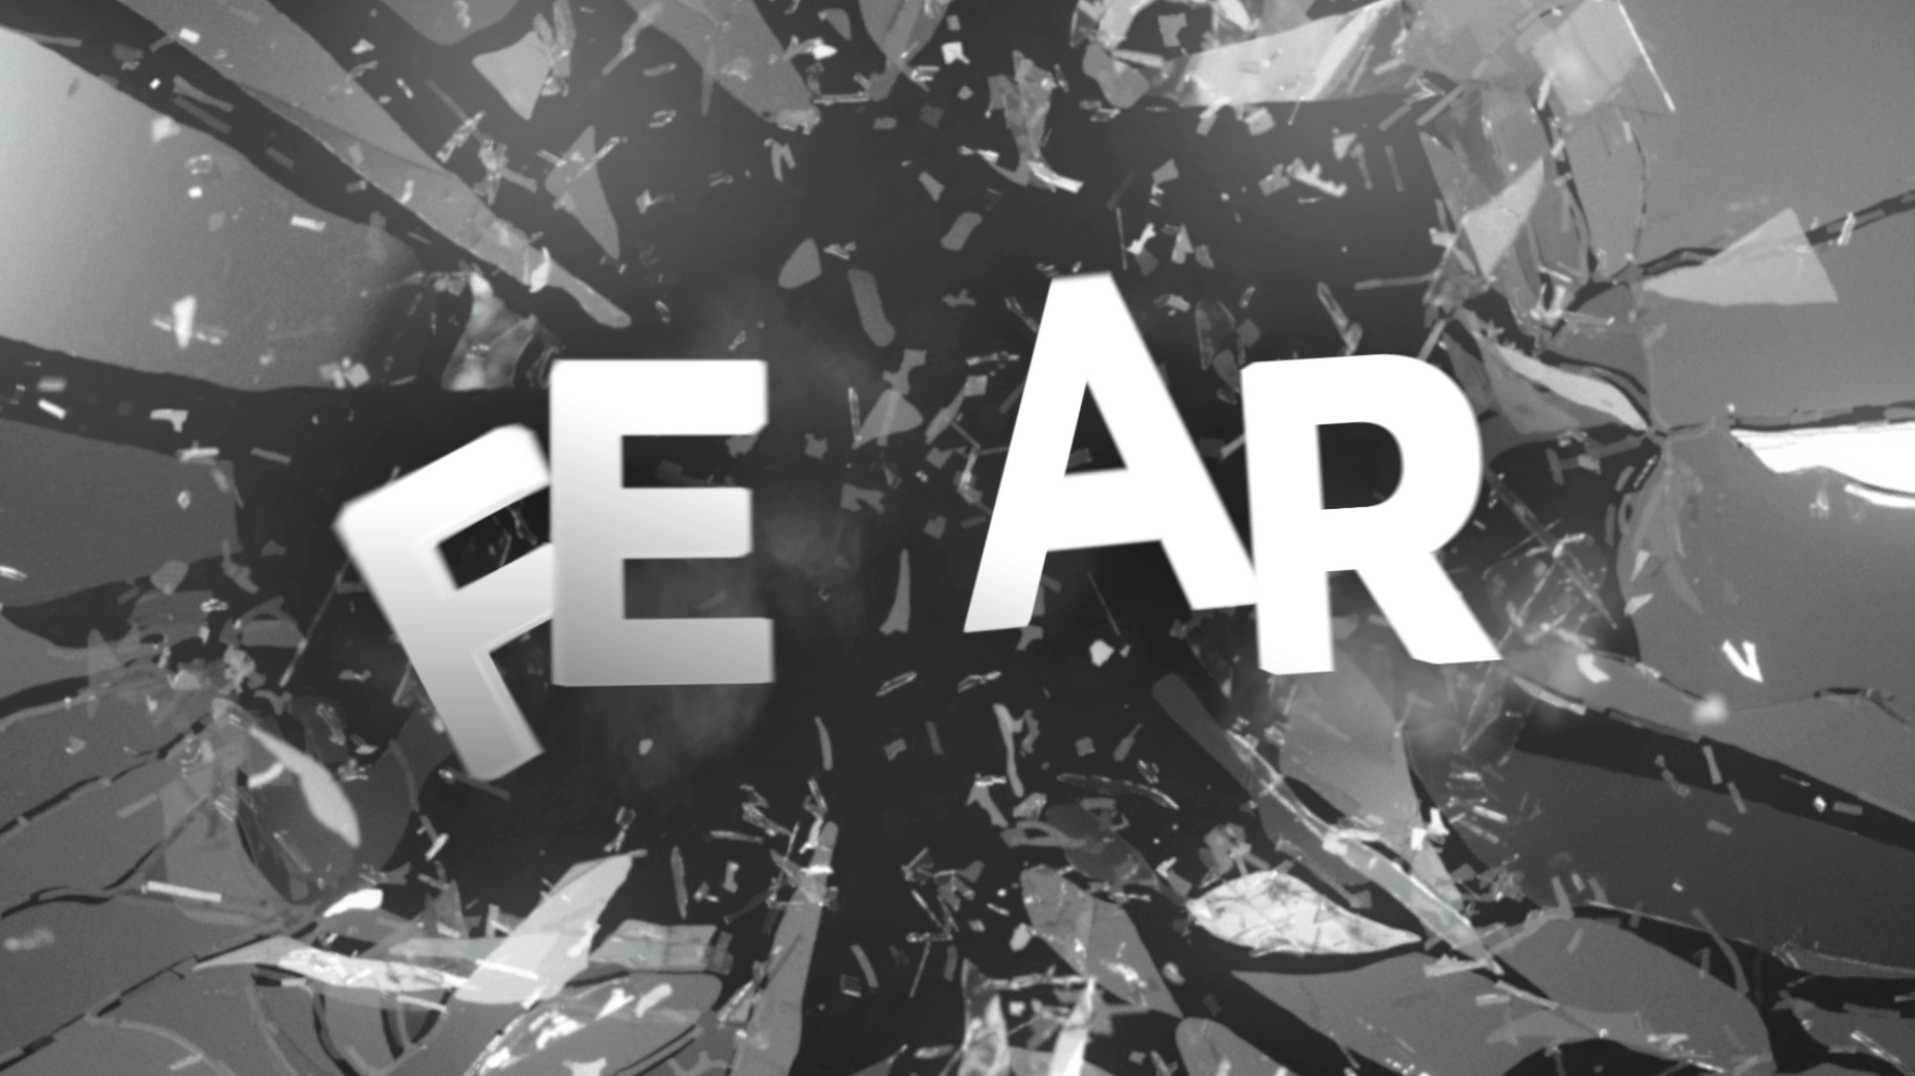 FEAR screenshot.png